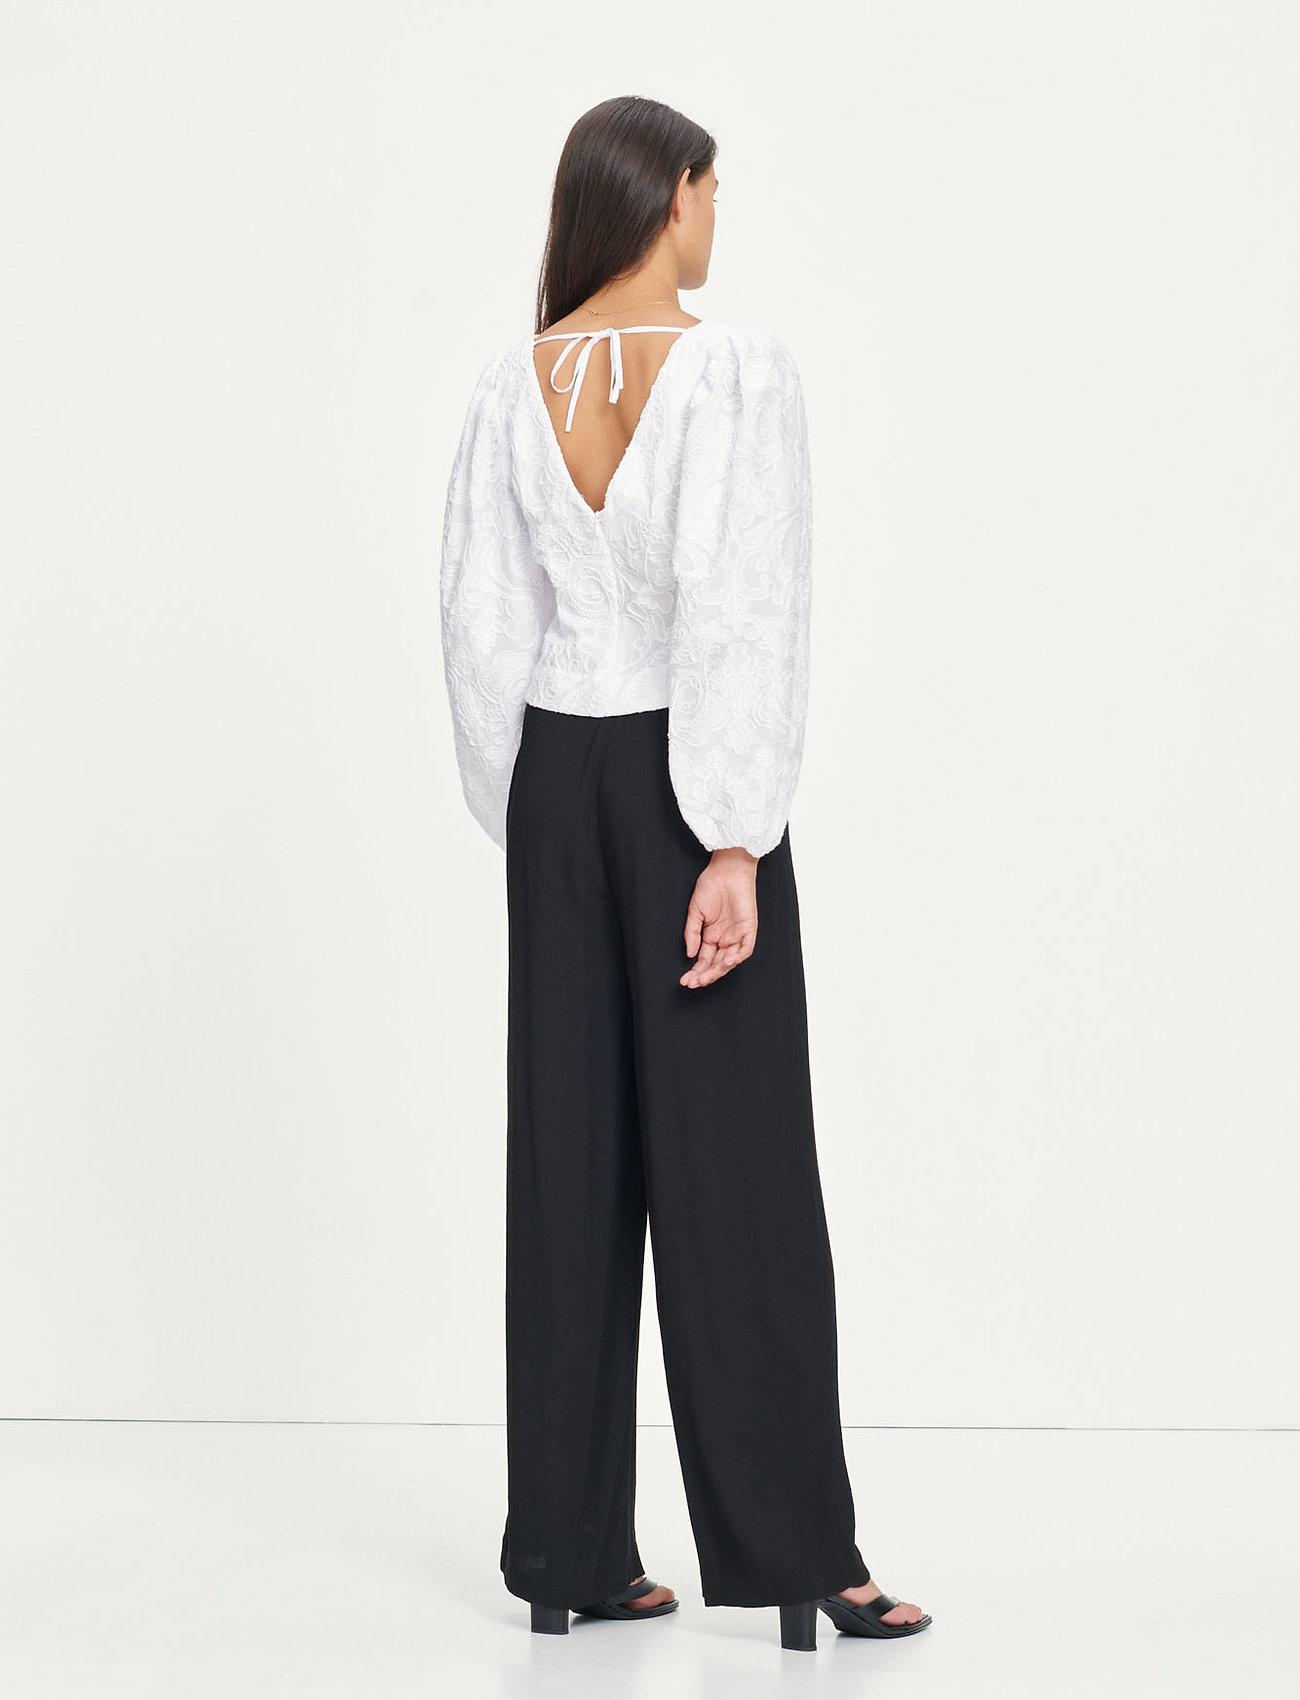 Samsøe Samsøe - Anai blouse 13089 - long sleeved blouses - bright white - 4